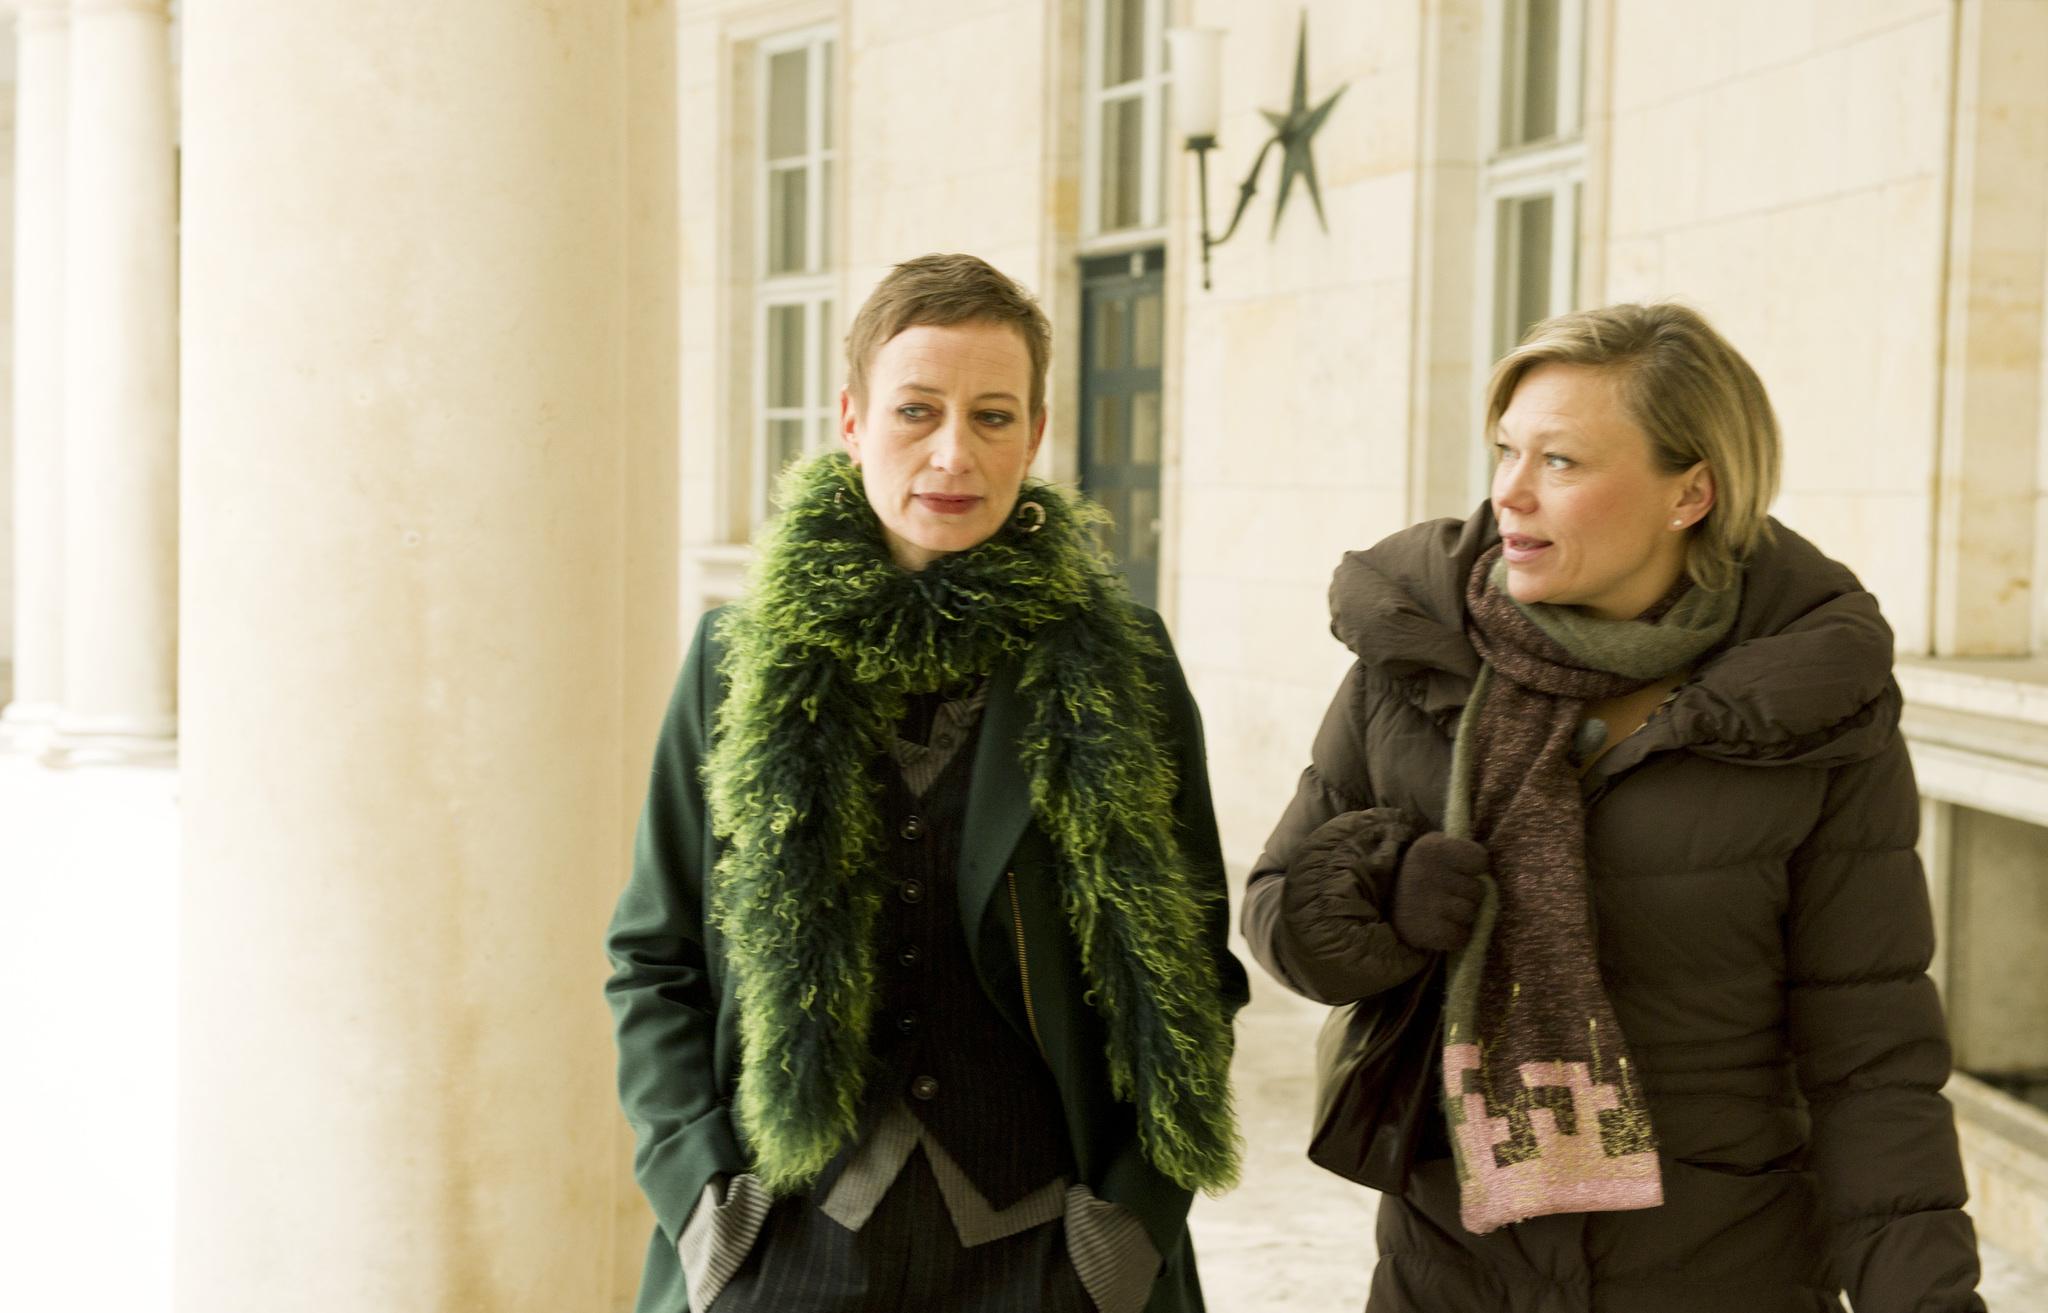 Sarah Boberg and Sofie Stougaard in Bron/Broen (2011)